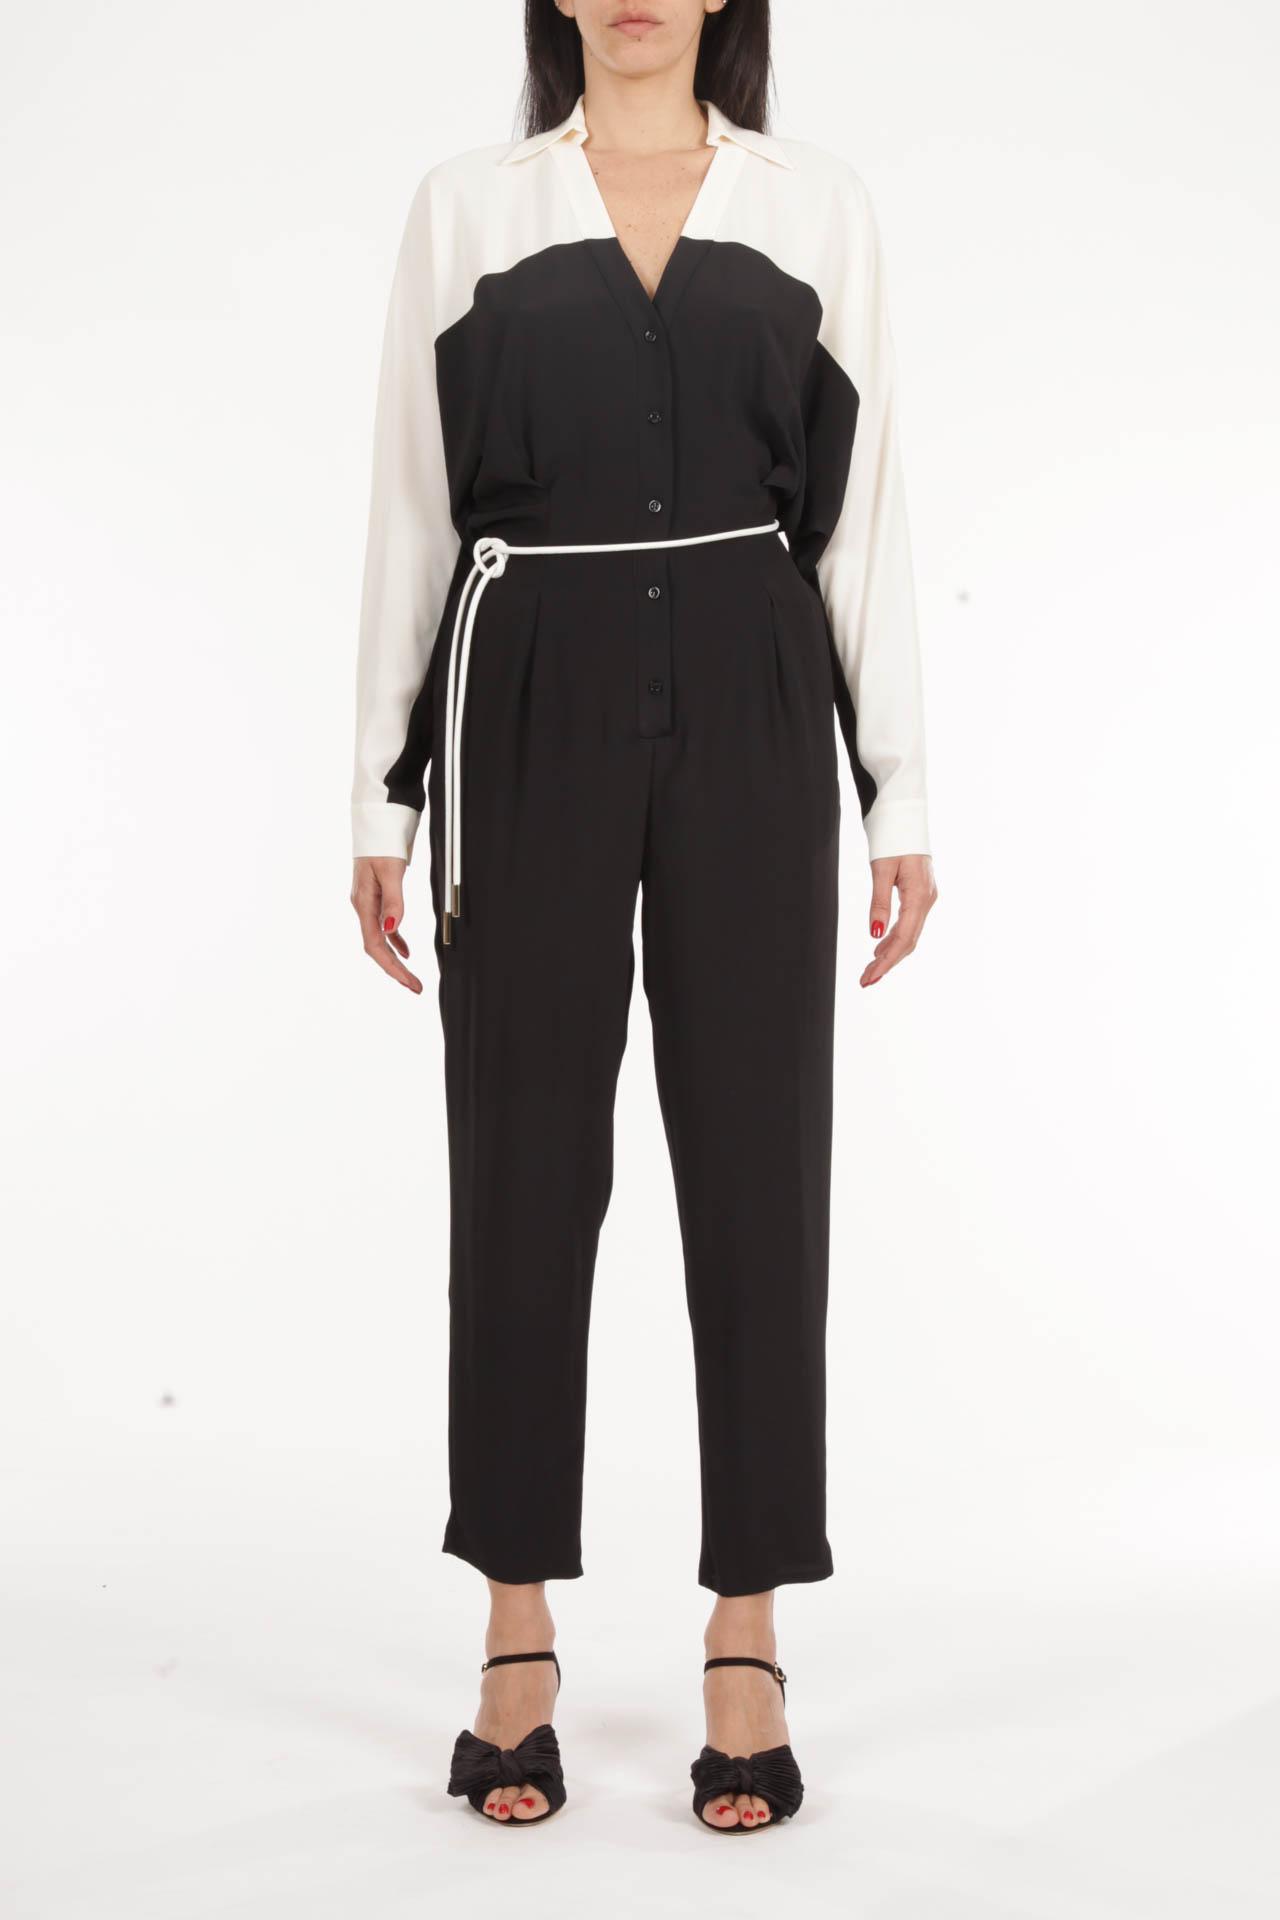 SIMONA CORSELLINI | Track suit | P21CPTU001-01-TACE0002NERO/BIANCO